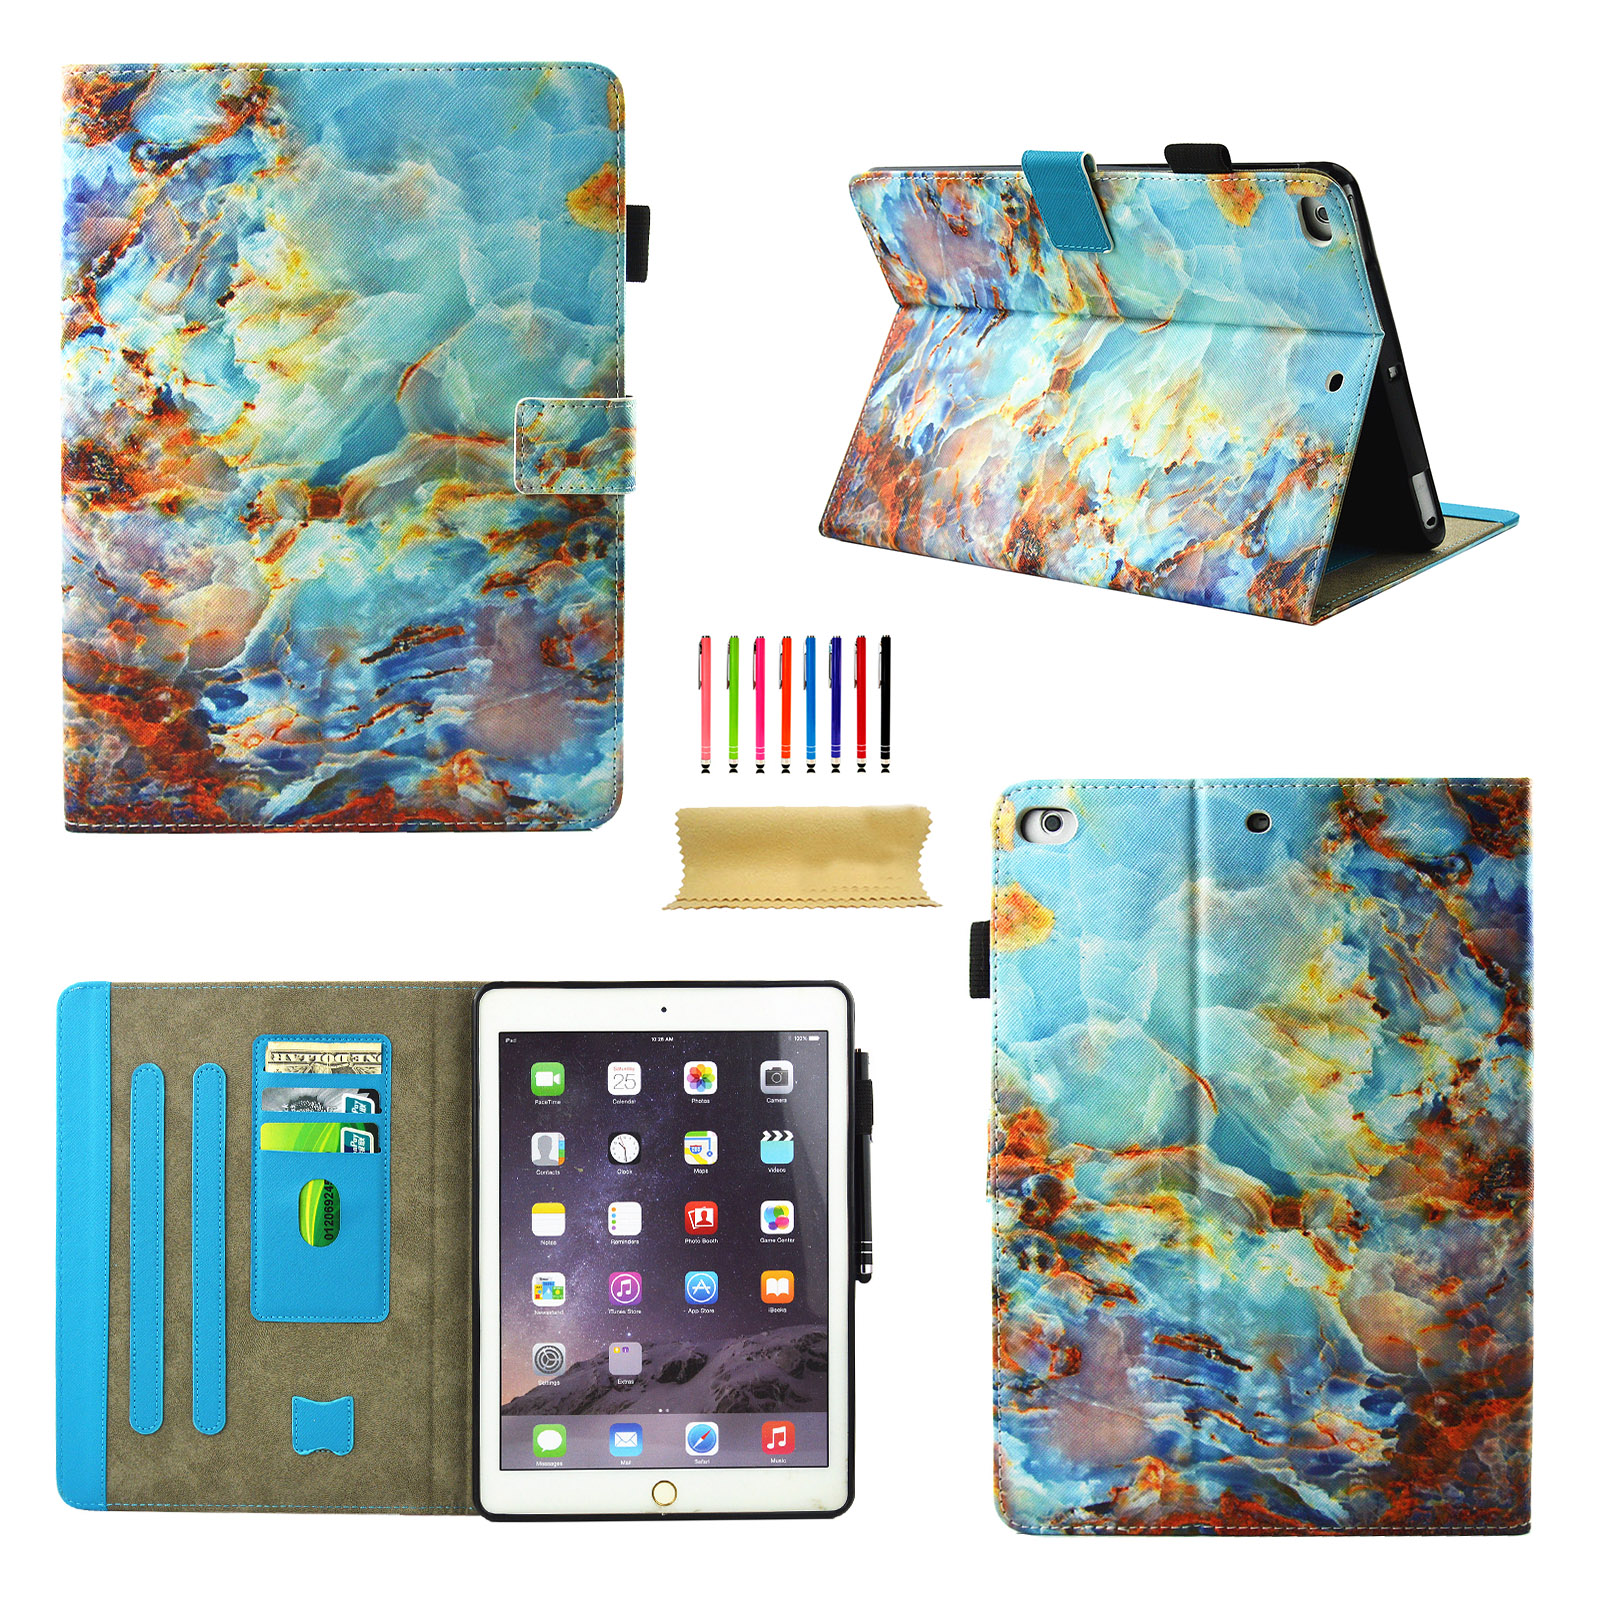 Cute Bow Bunny Rabbit Smart Case Cover For Apple iPad Air ... |Cute Ipad Cases